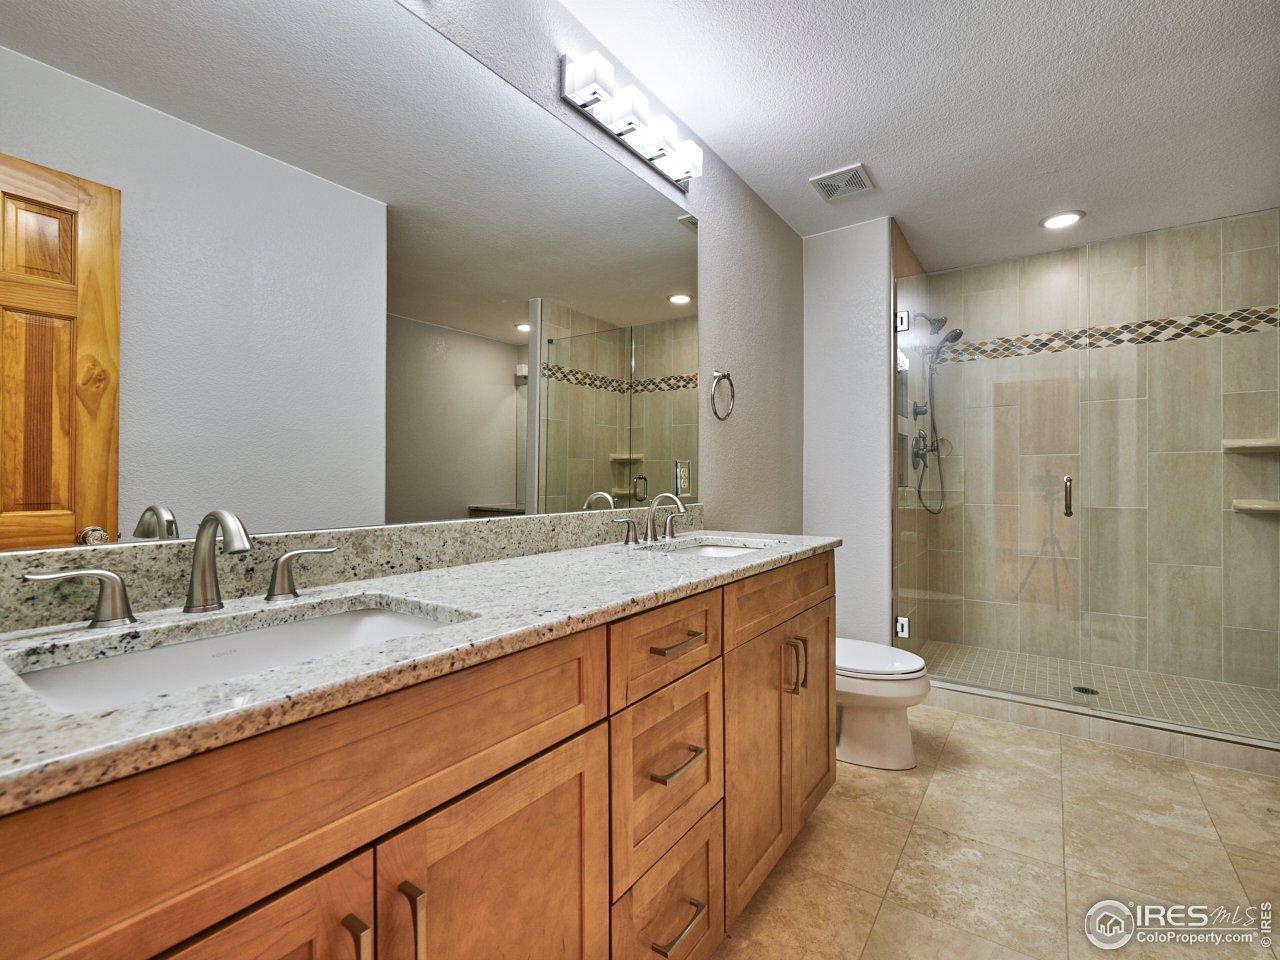 Master Bathroom Double Sinks and Granite